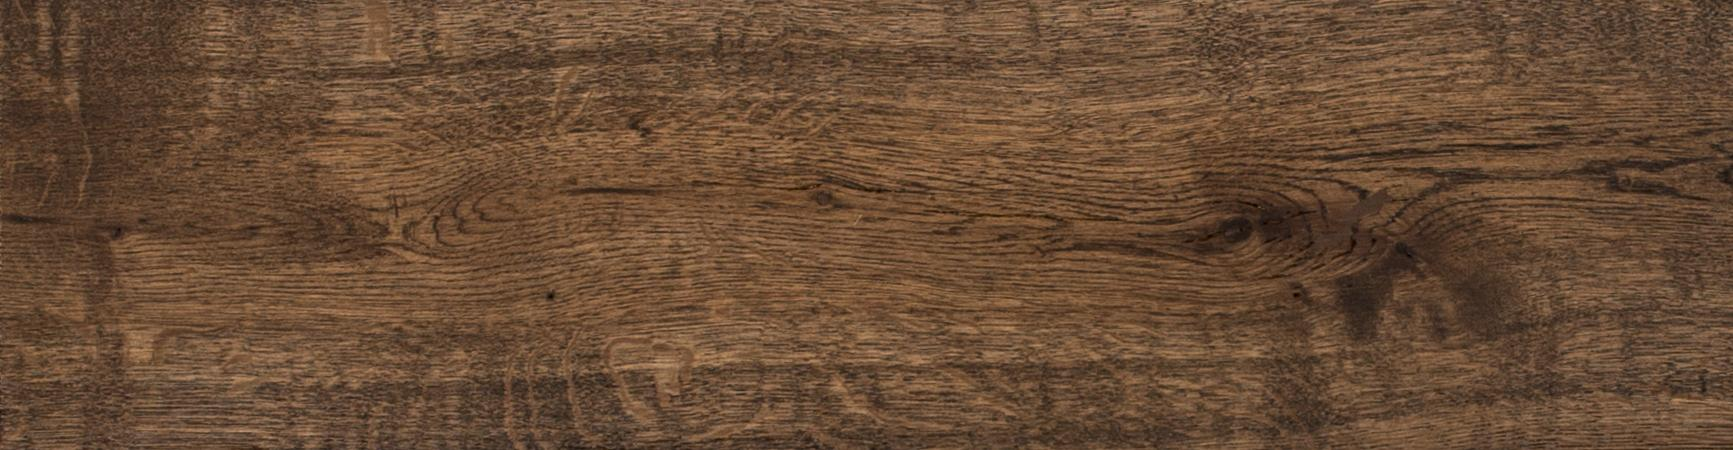 Old Oak Wood ~ Natura solid european oak fumed antique wood flooring